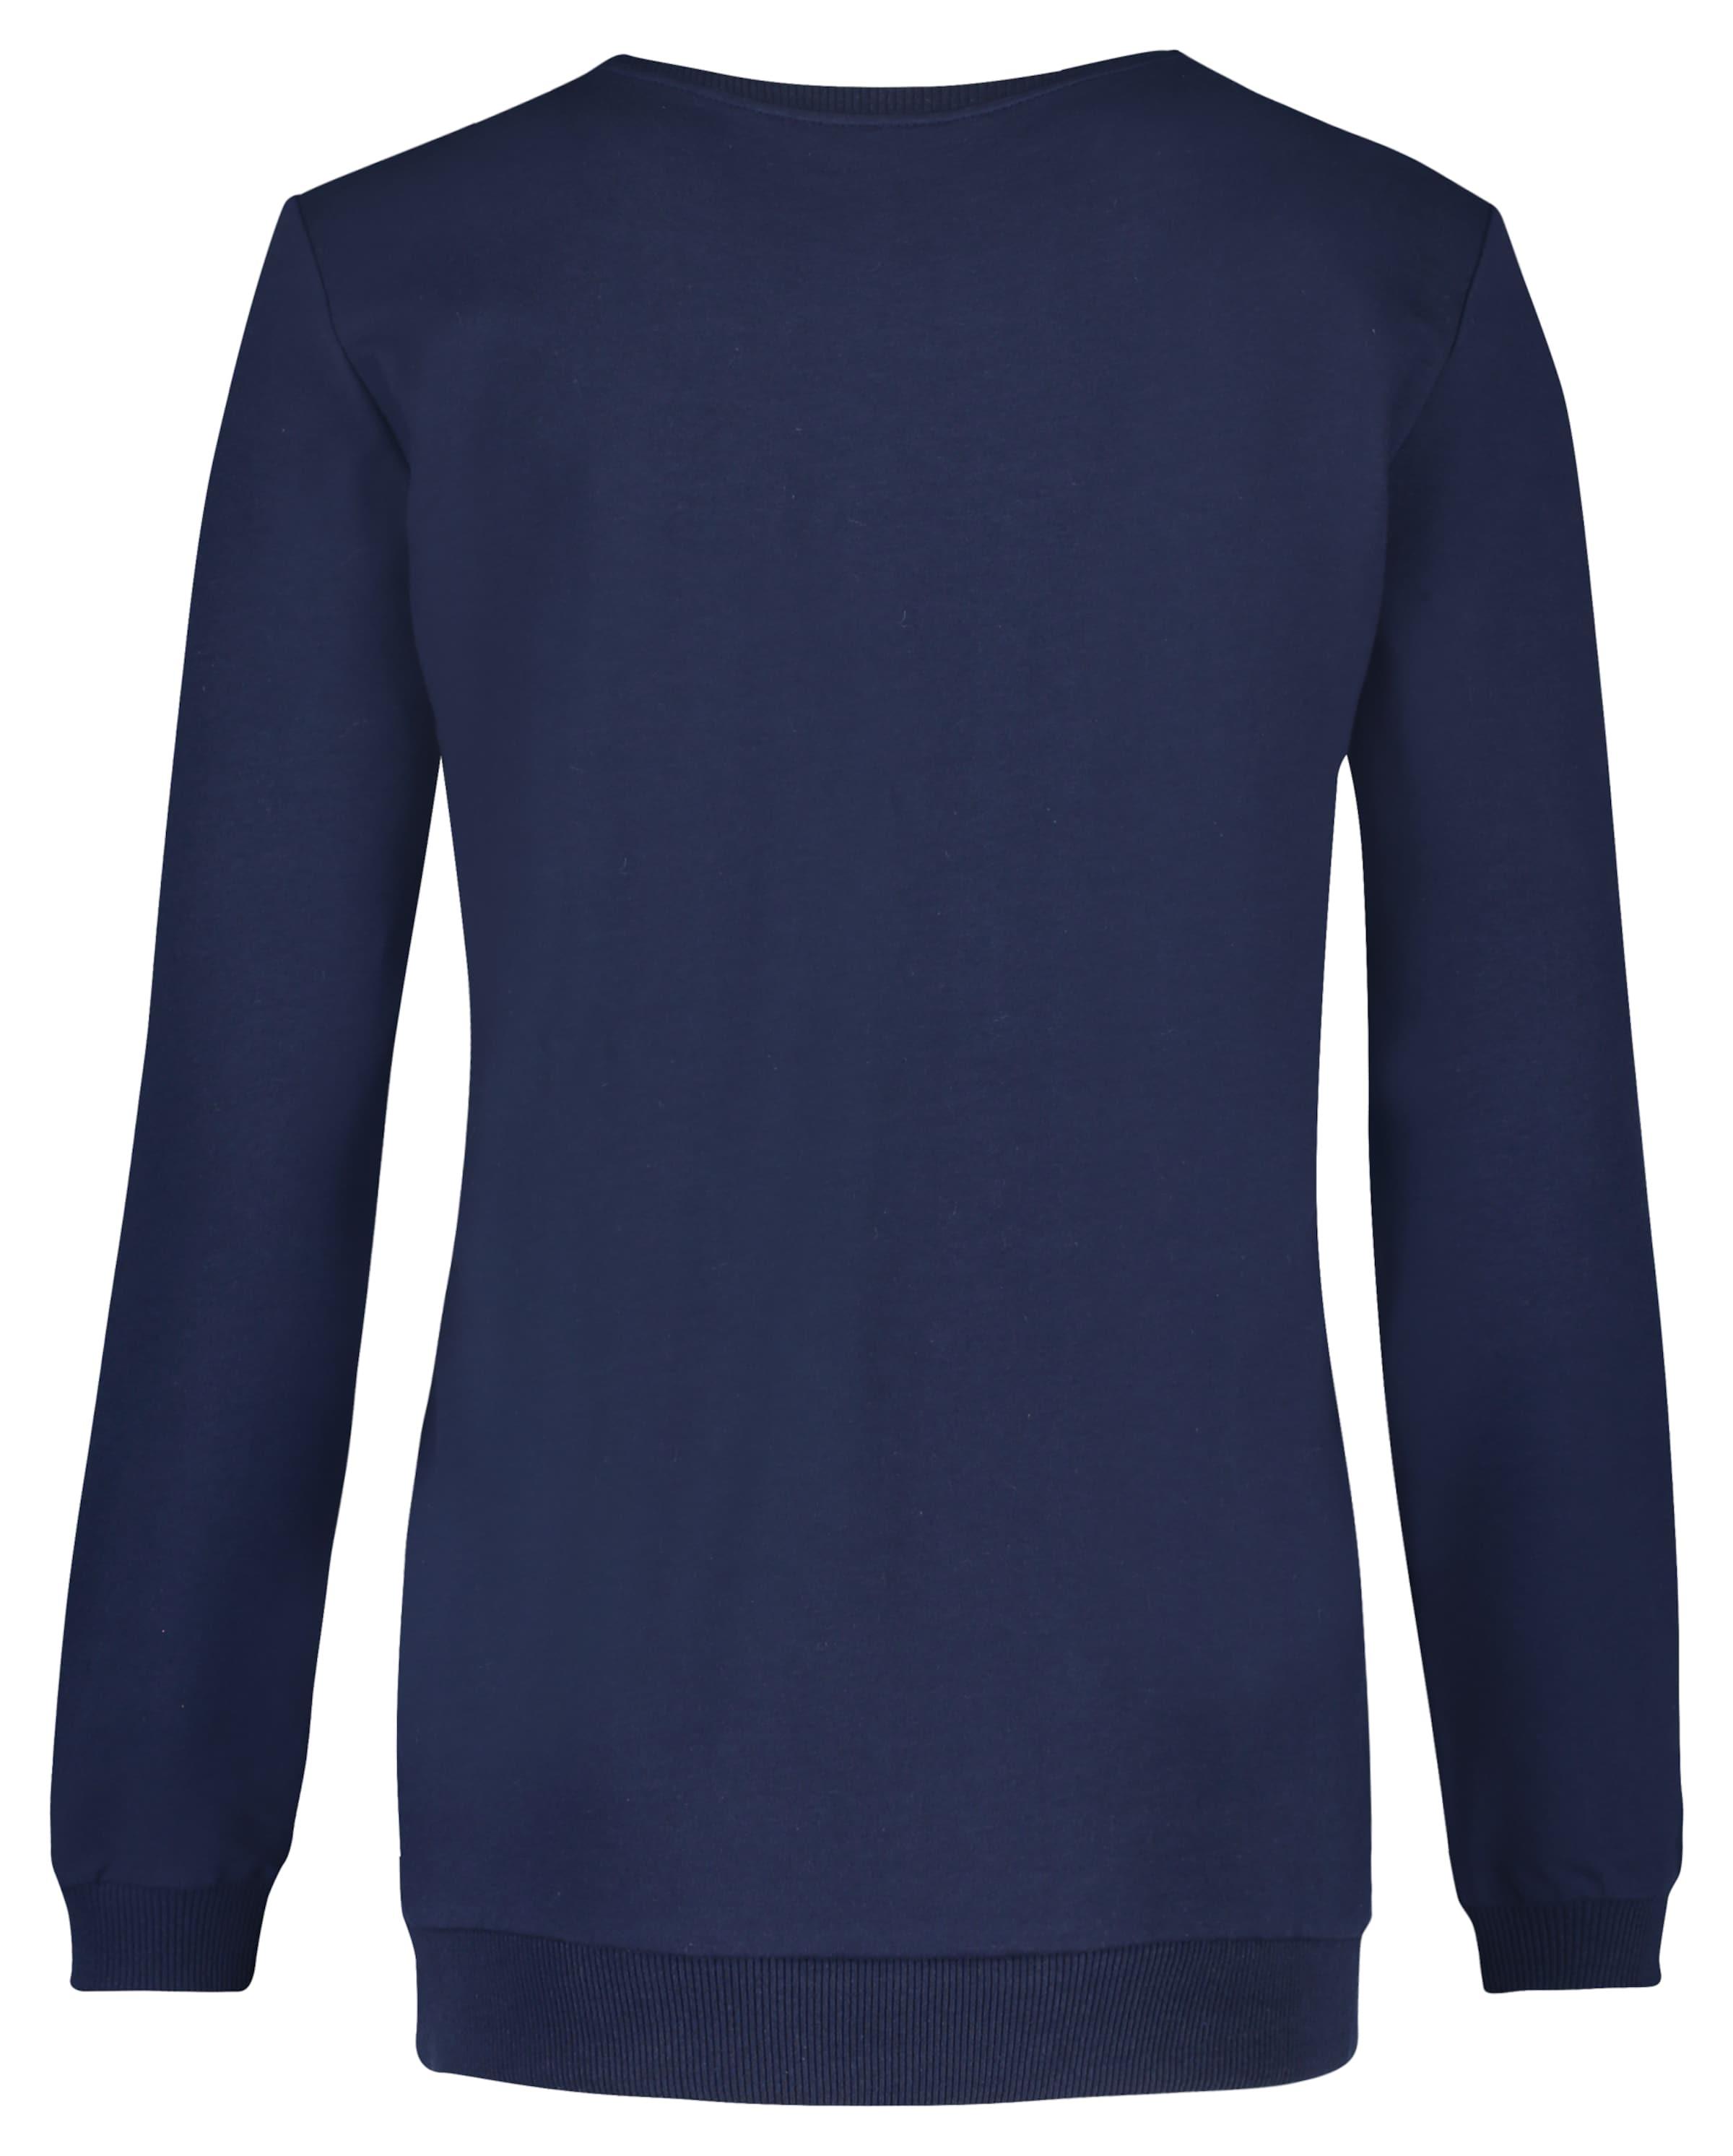 'onisha' Nachtblau 'onisha' In Noppies In Pullover Noppies Noppies Pullover Pullover 'onisha' Nachtblau 4AL53Rjq